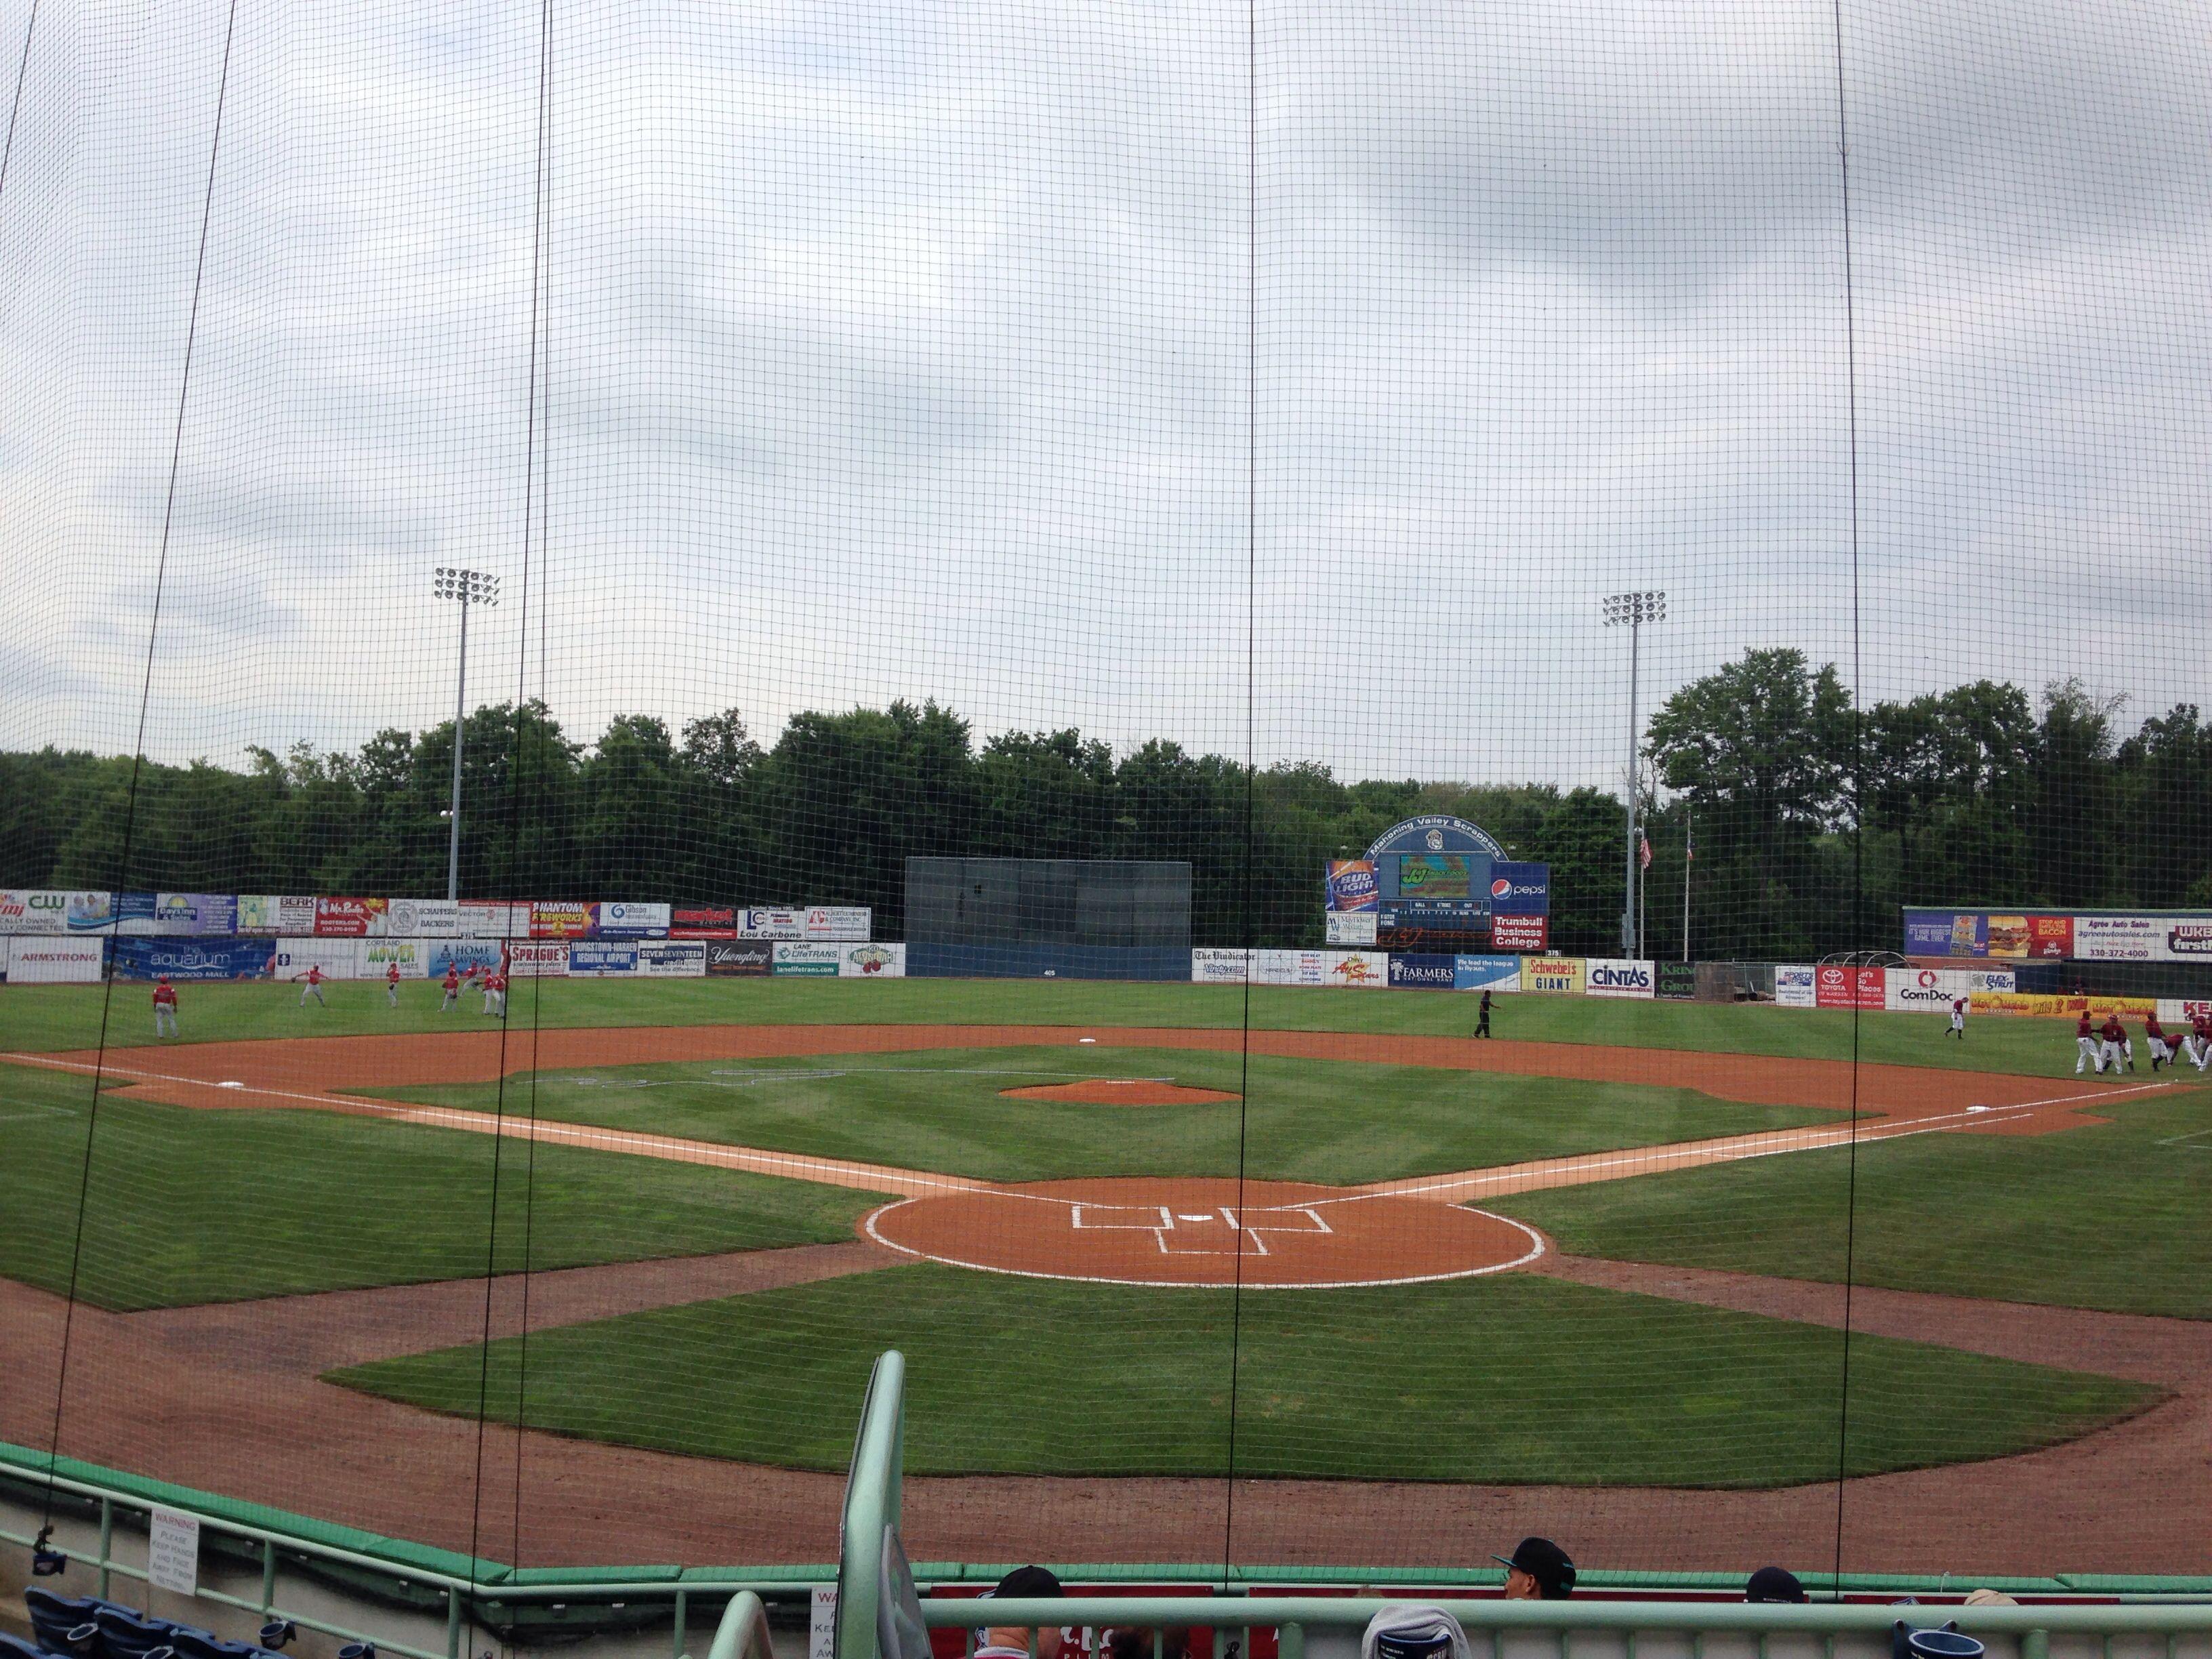 Mahoning Valley Scrappers Eastwood Field Baseball Park Baseball Stadium Minor League Baseball